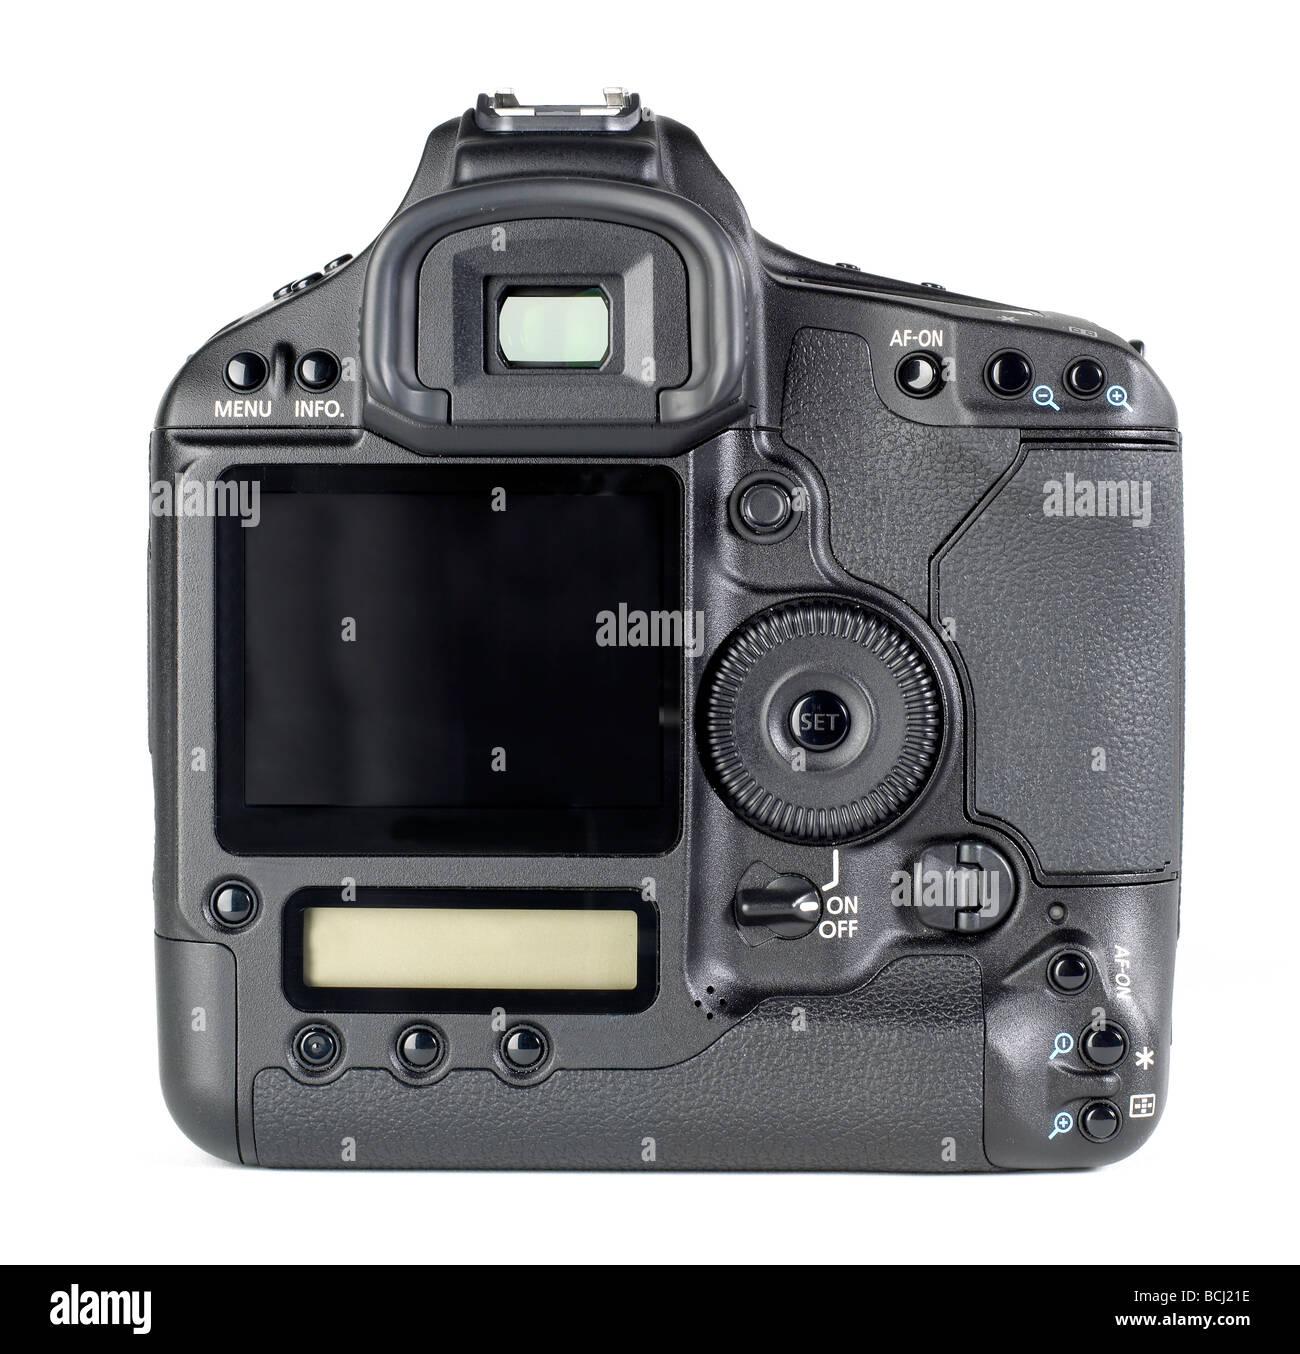 35mm DSLR camera body back digital Format - Stock Image